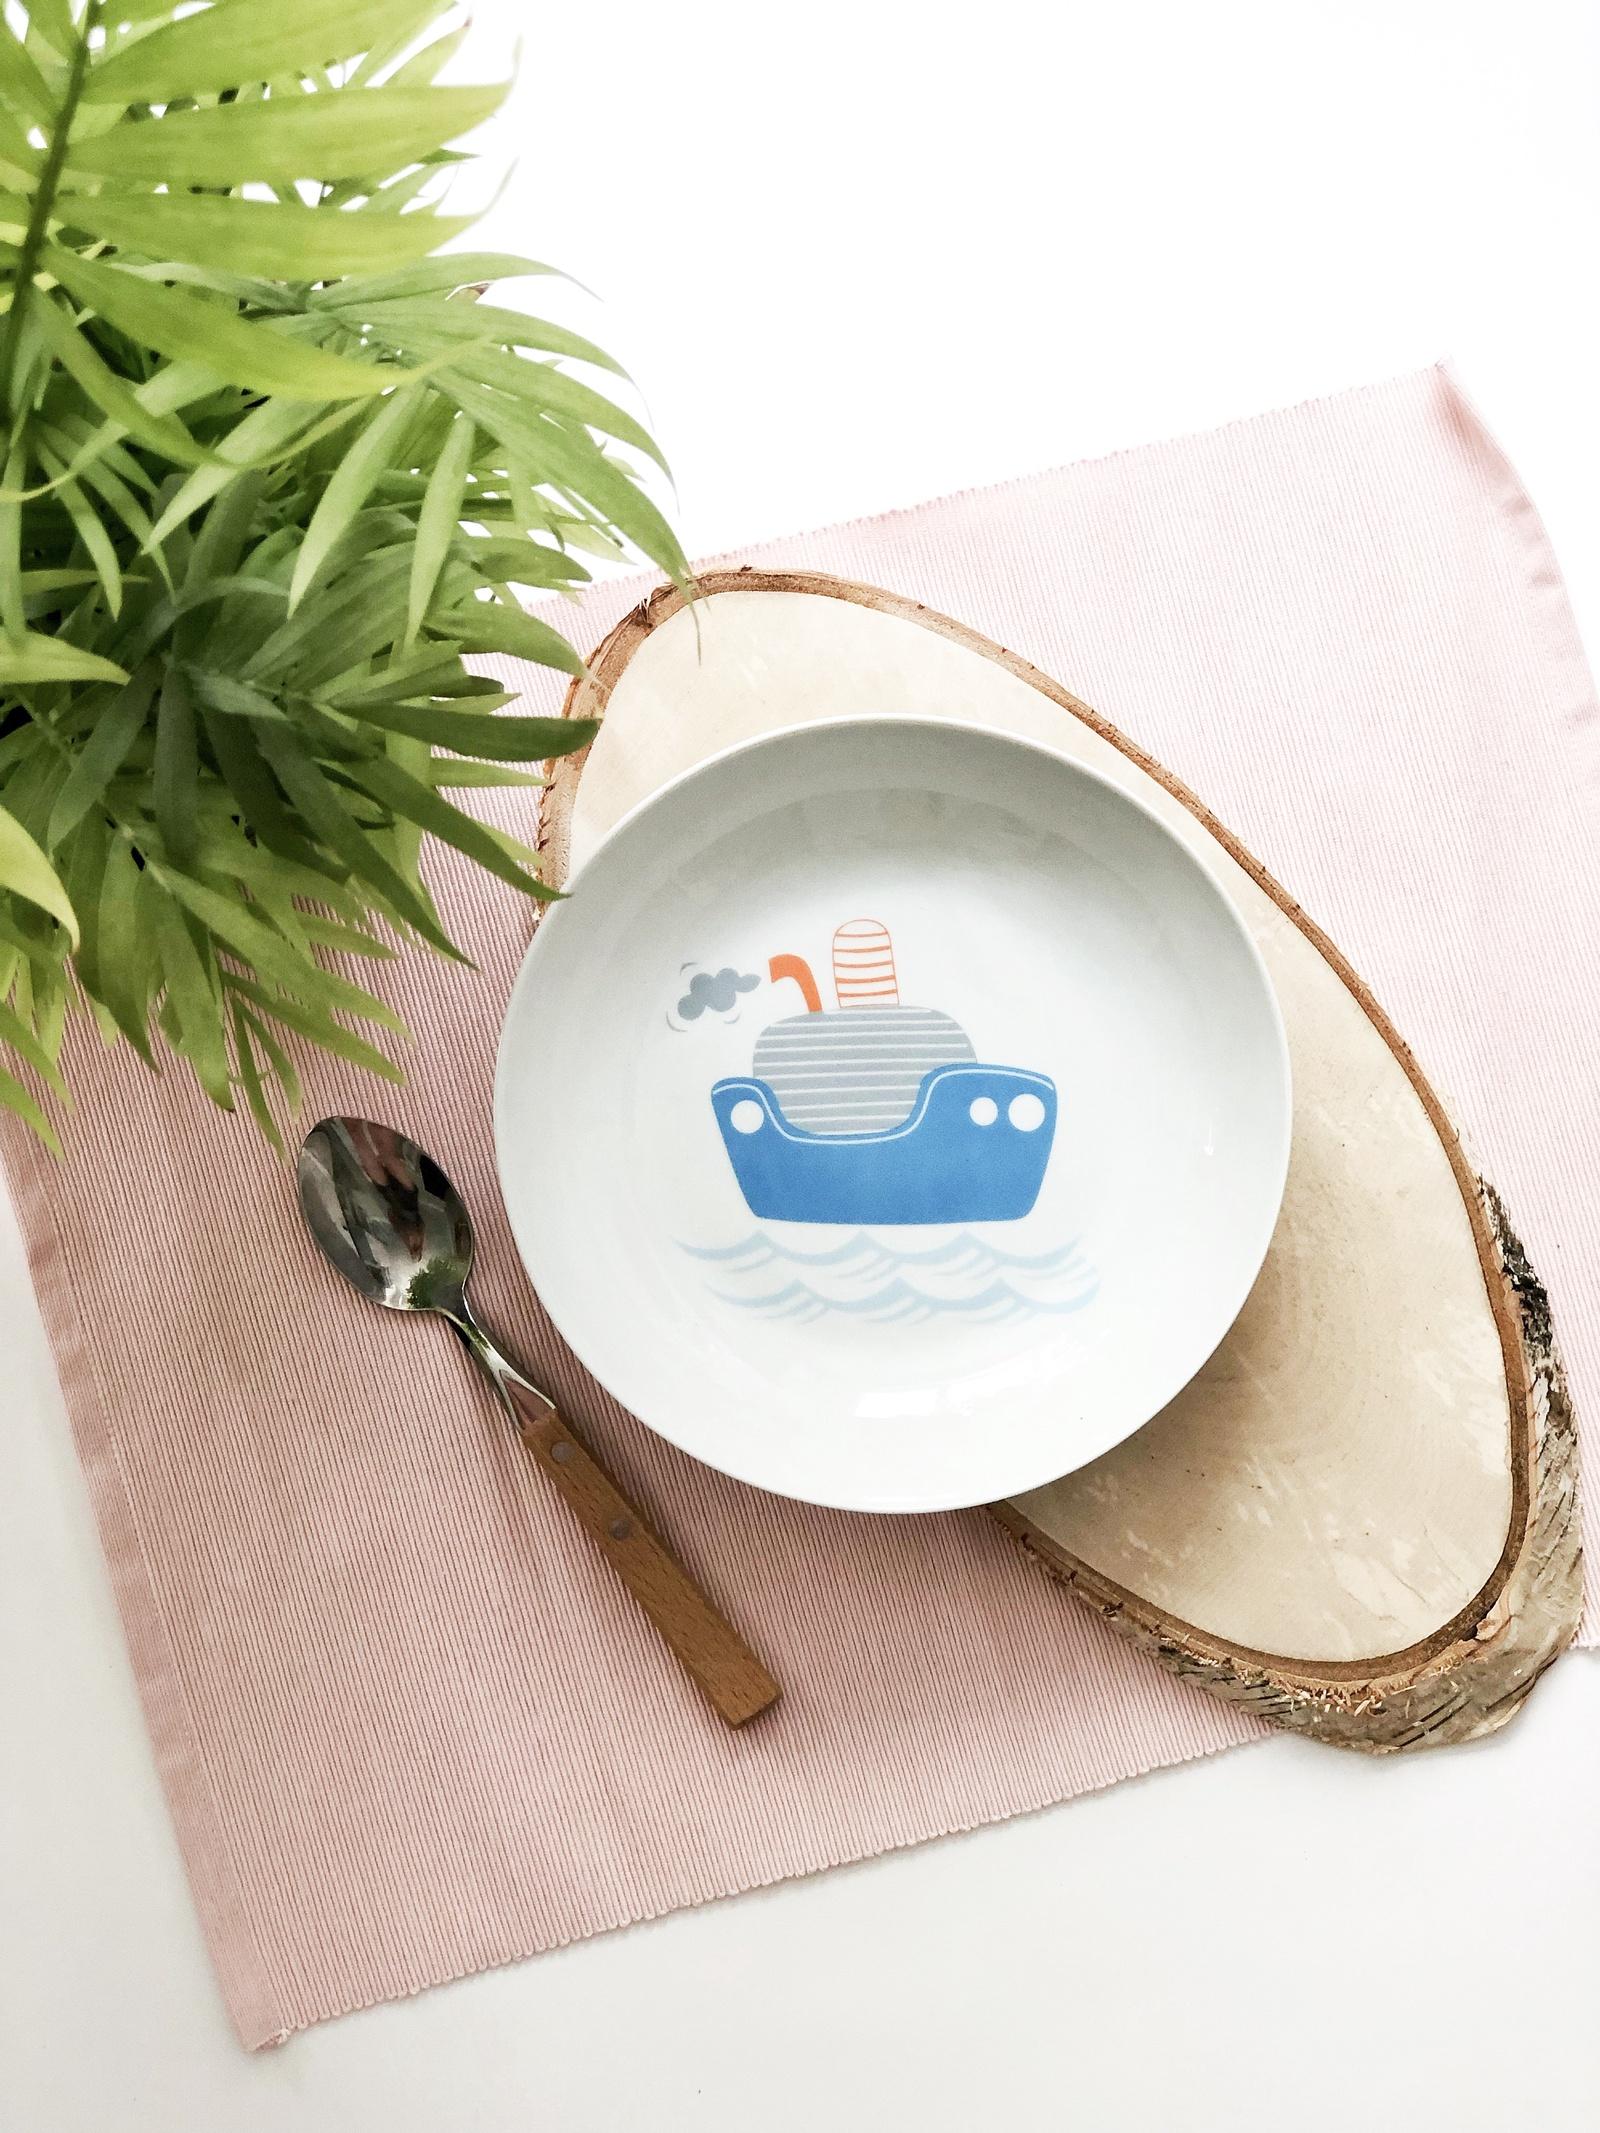 Тарелка глубокая Сотвори Чудо Кораблик Sans Brides 20 см, белый тарелка мелкая сотвори чудо бананы диаметр 20 см